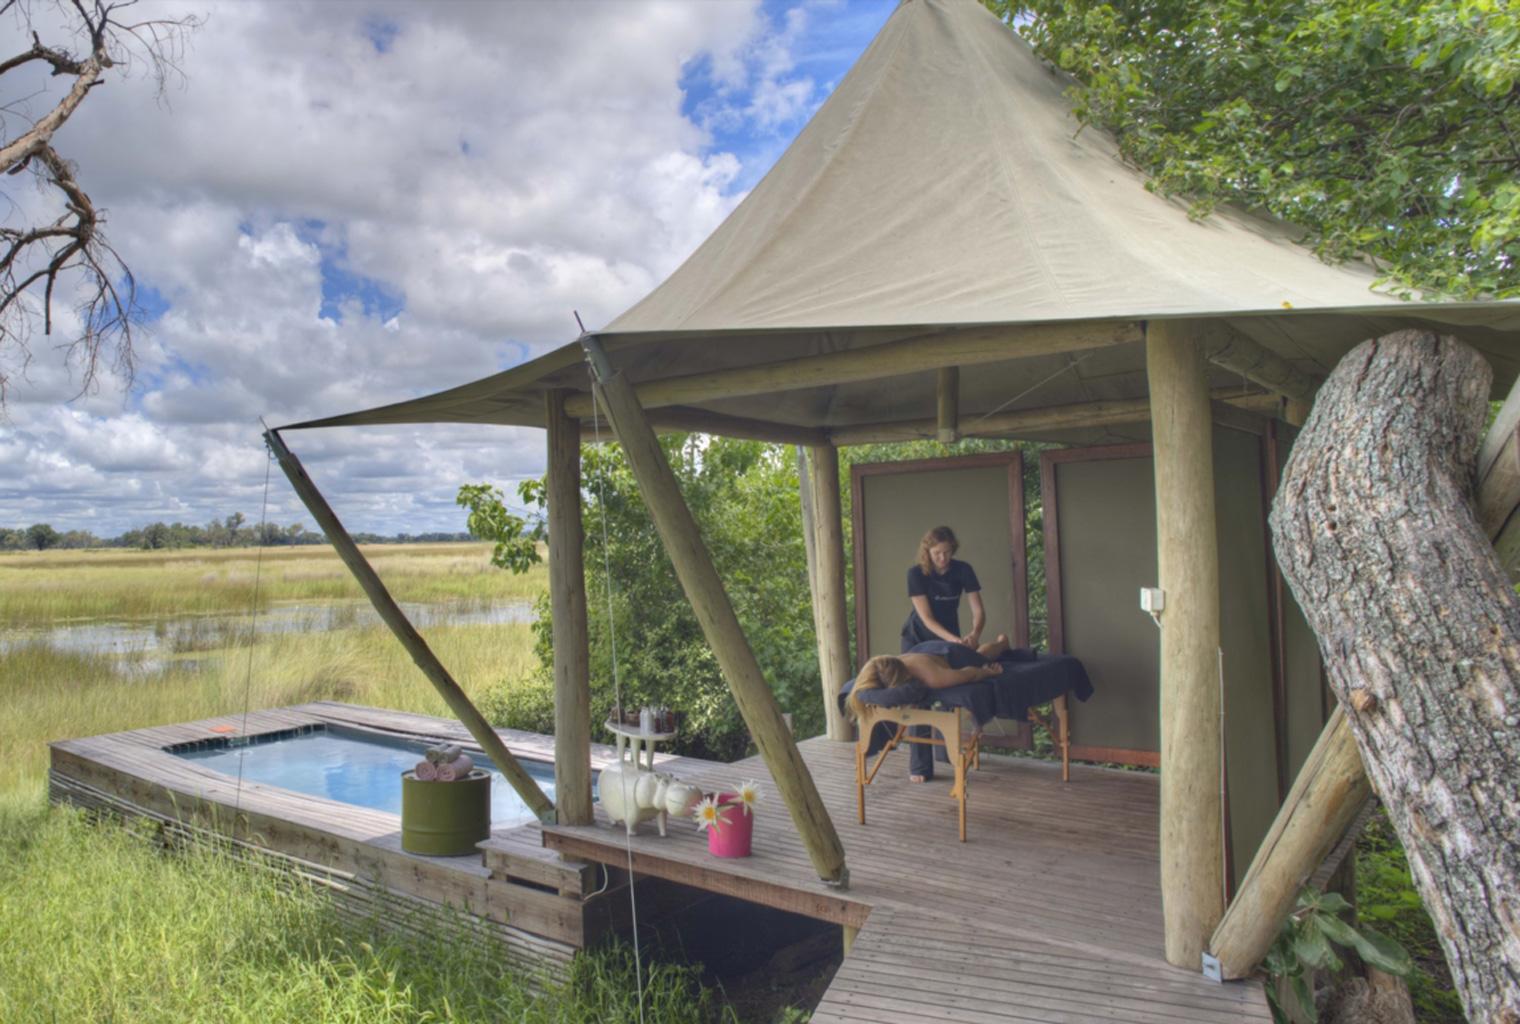 &Beyond, Xaranna, Okavango Delta, Camp, Massage